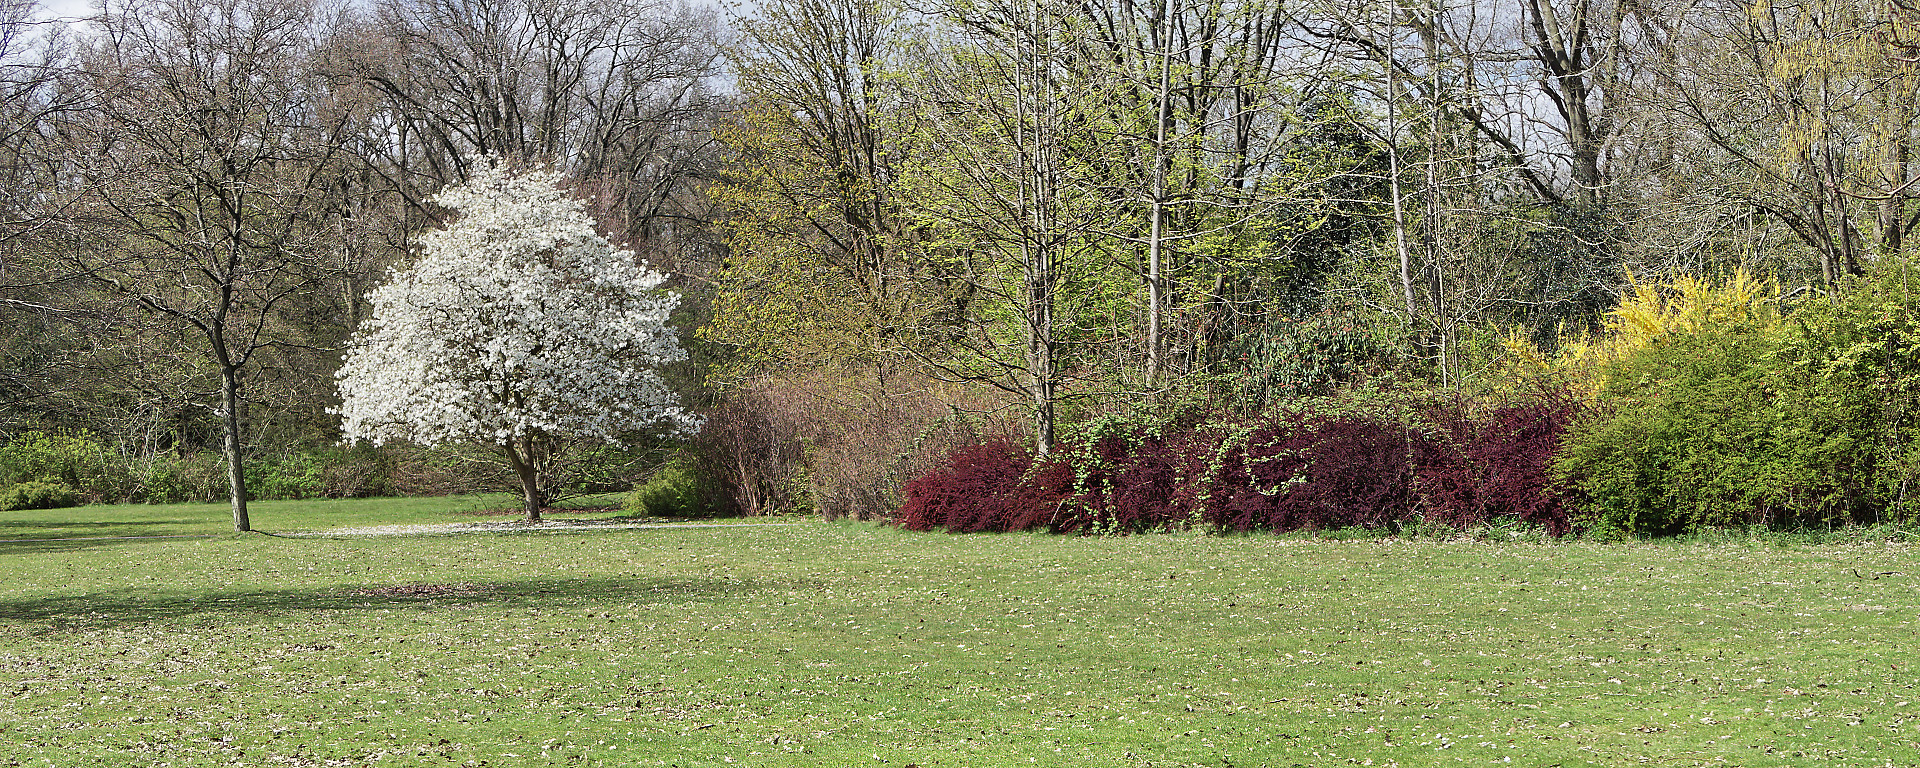 bomen en struiken in bloei